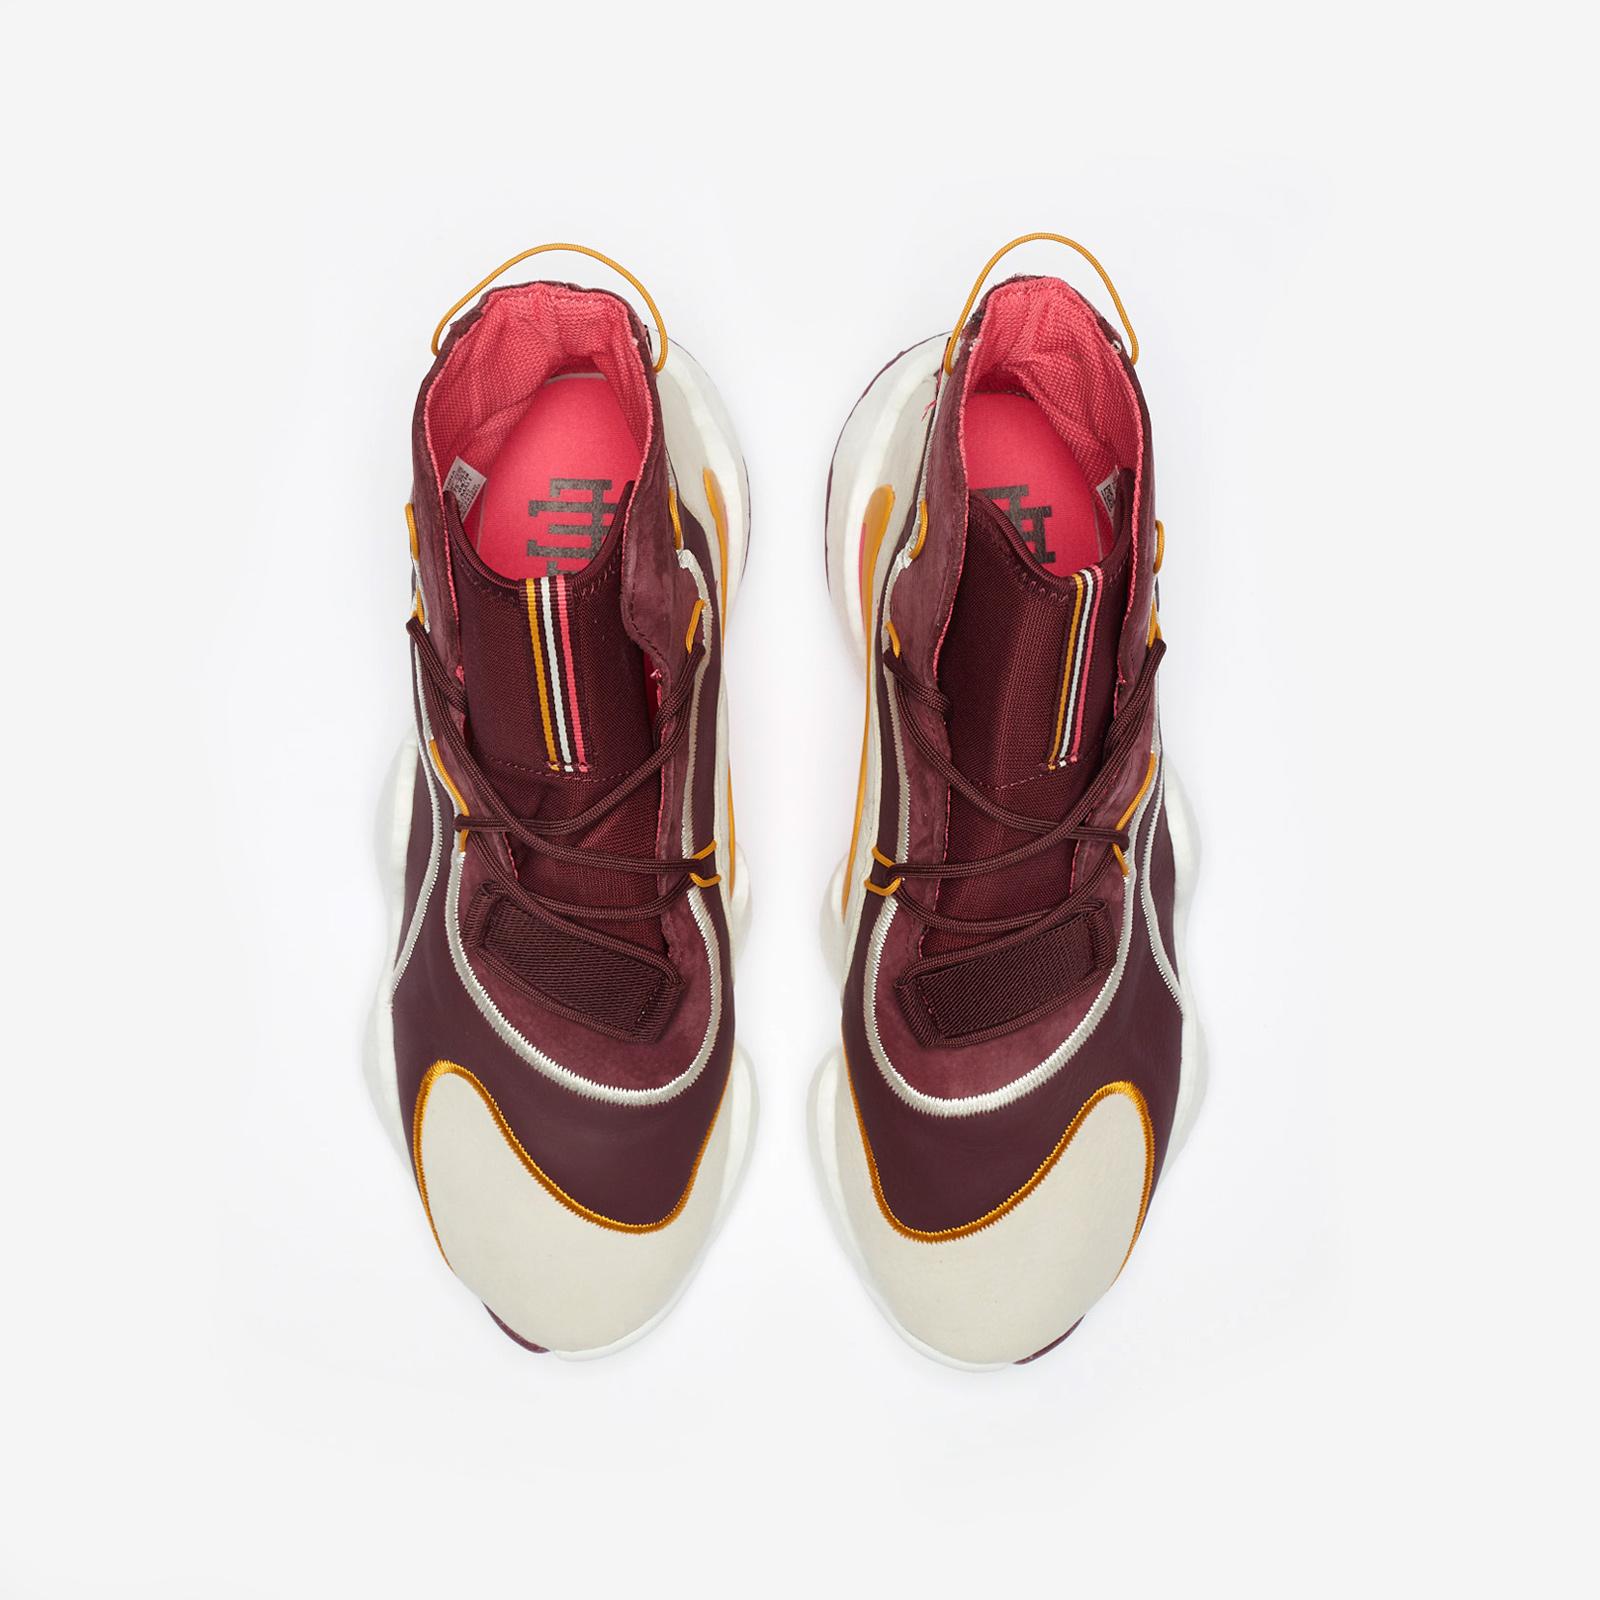 quality design 1f155 bca22 ... adidas Consortium Crazy BYW x Eric Emanuel ...